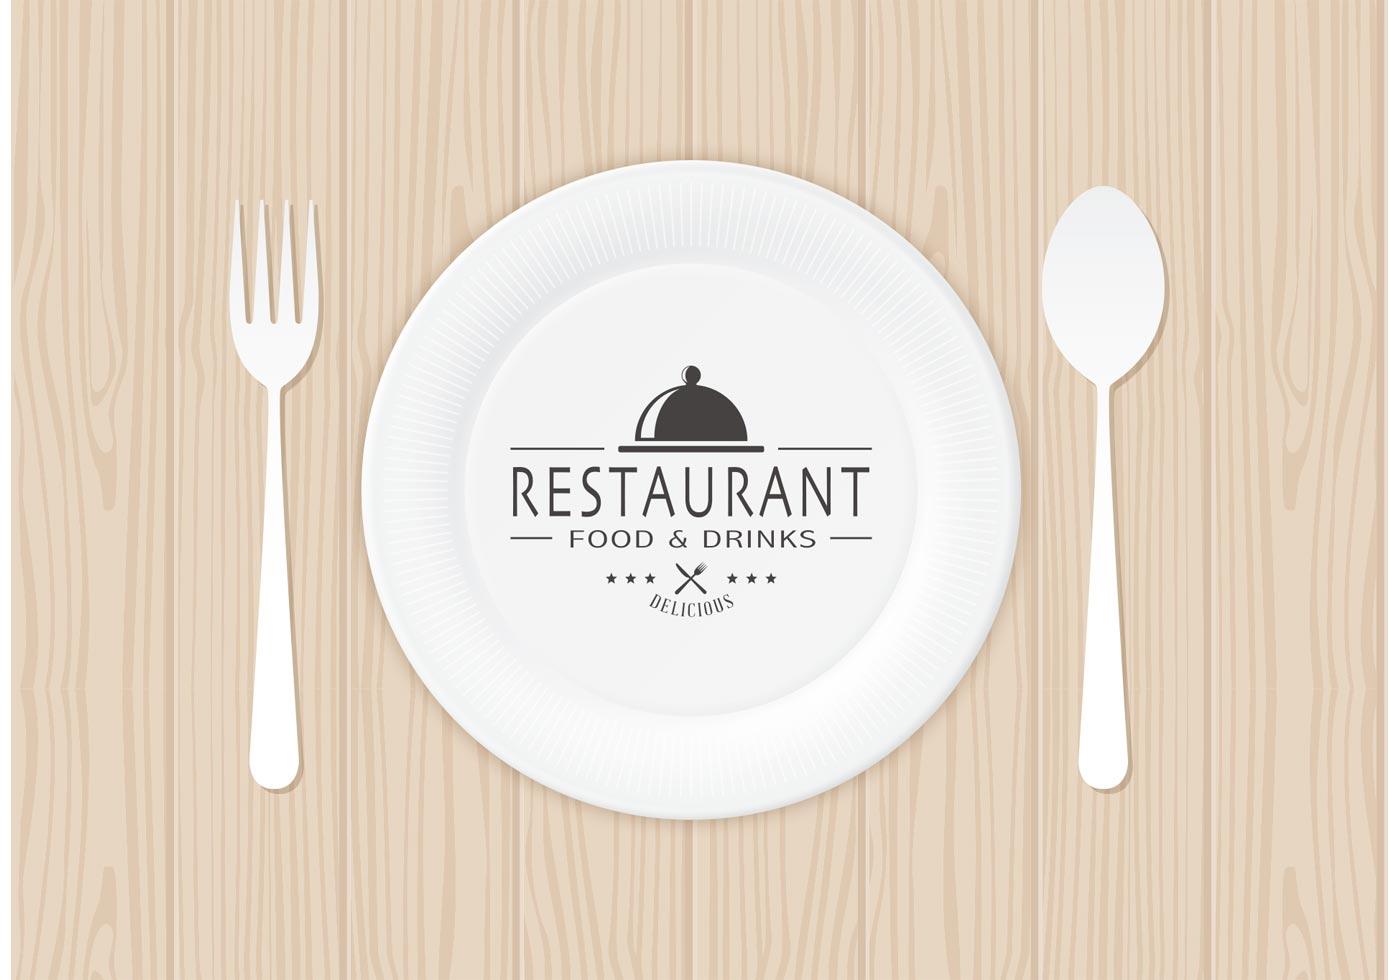 restaurant clipart download - photo #28